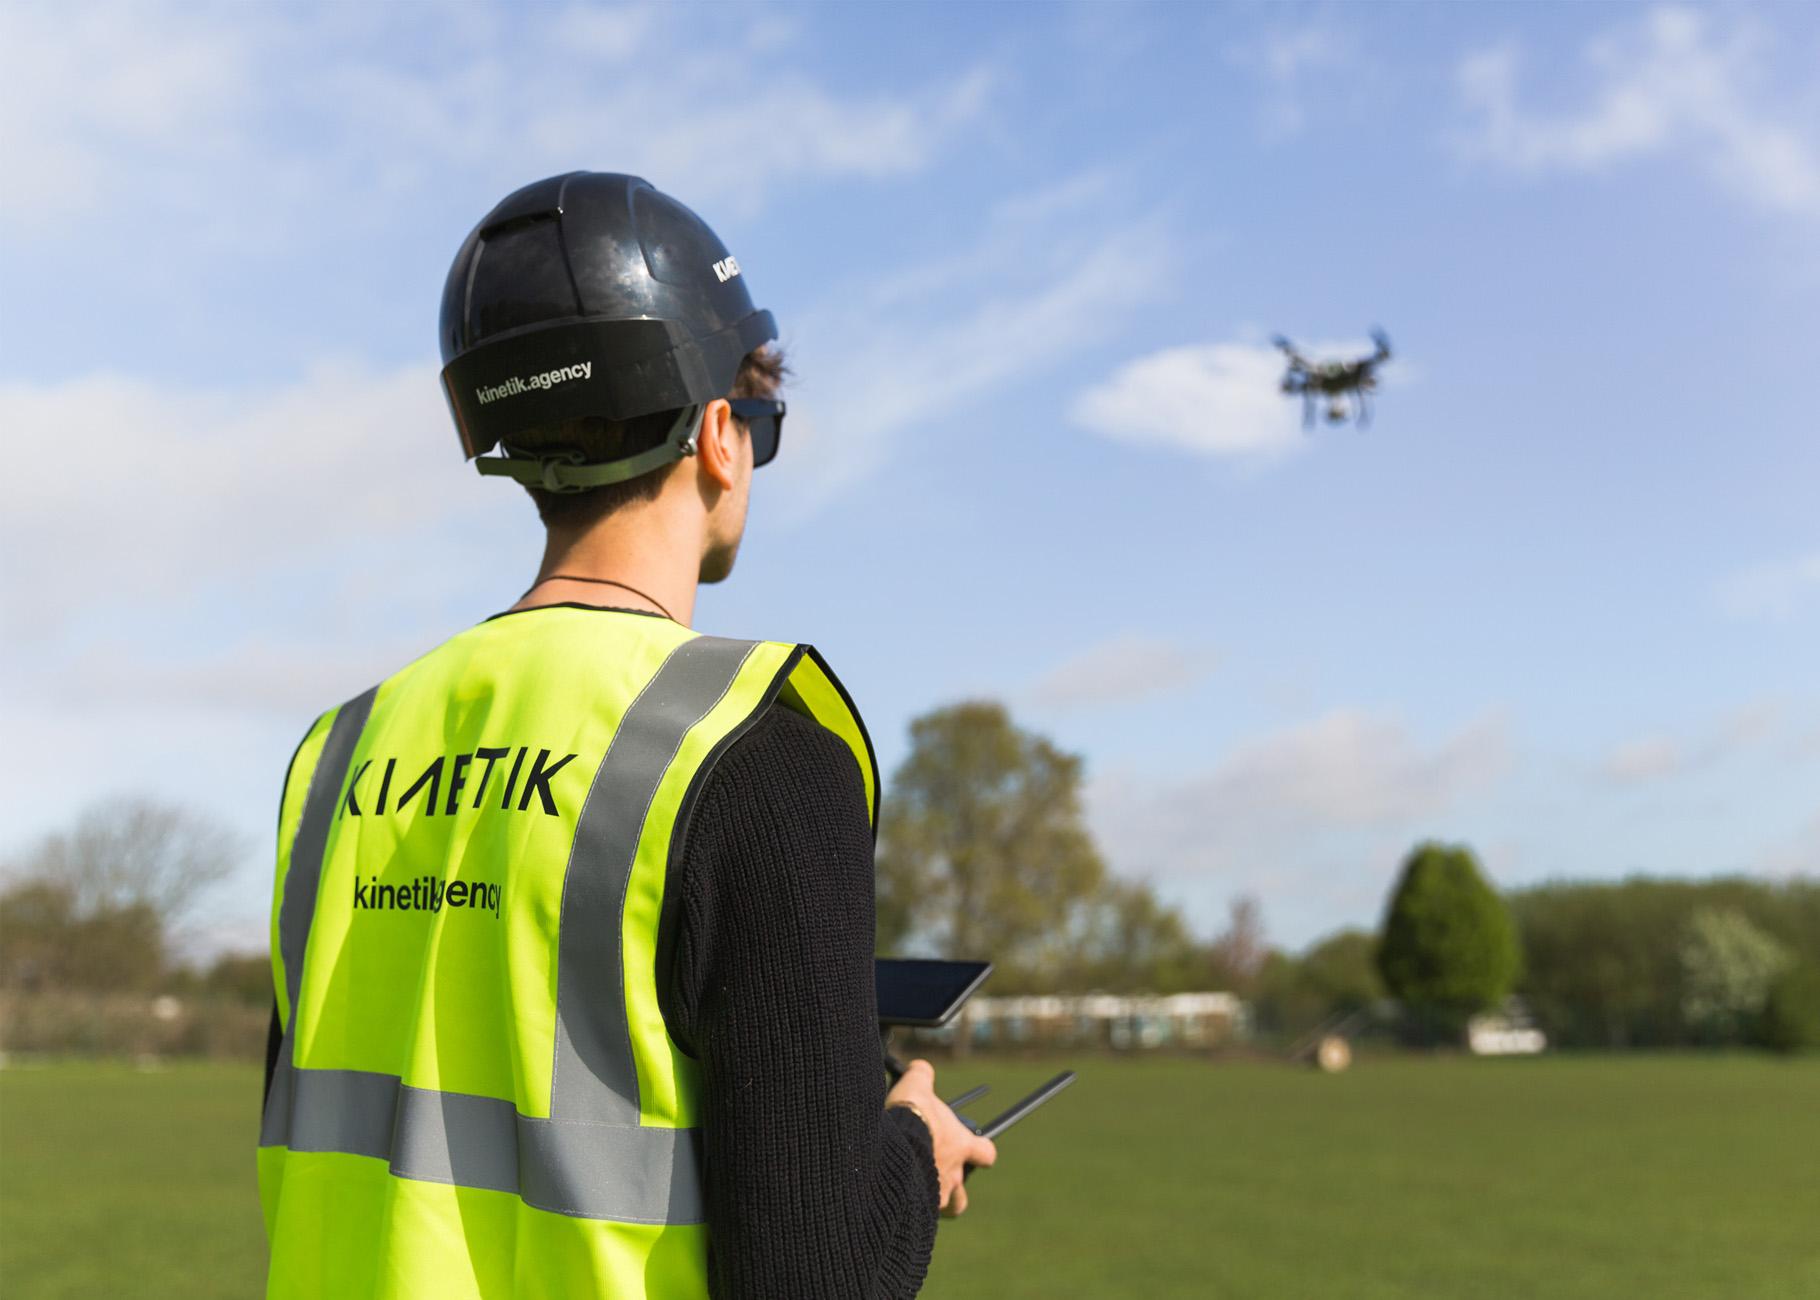 kinetik-drone